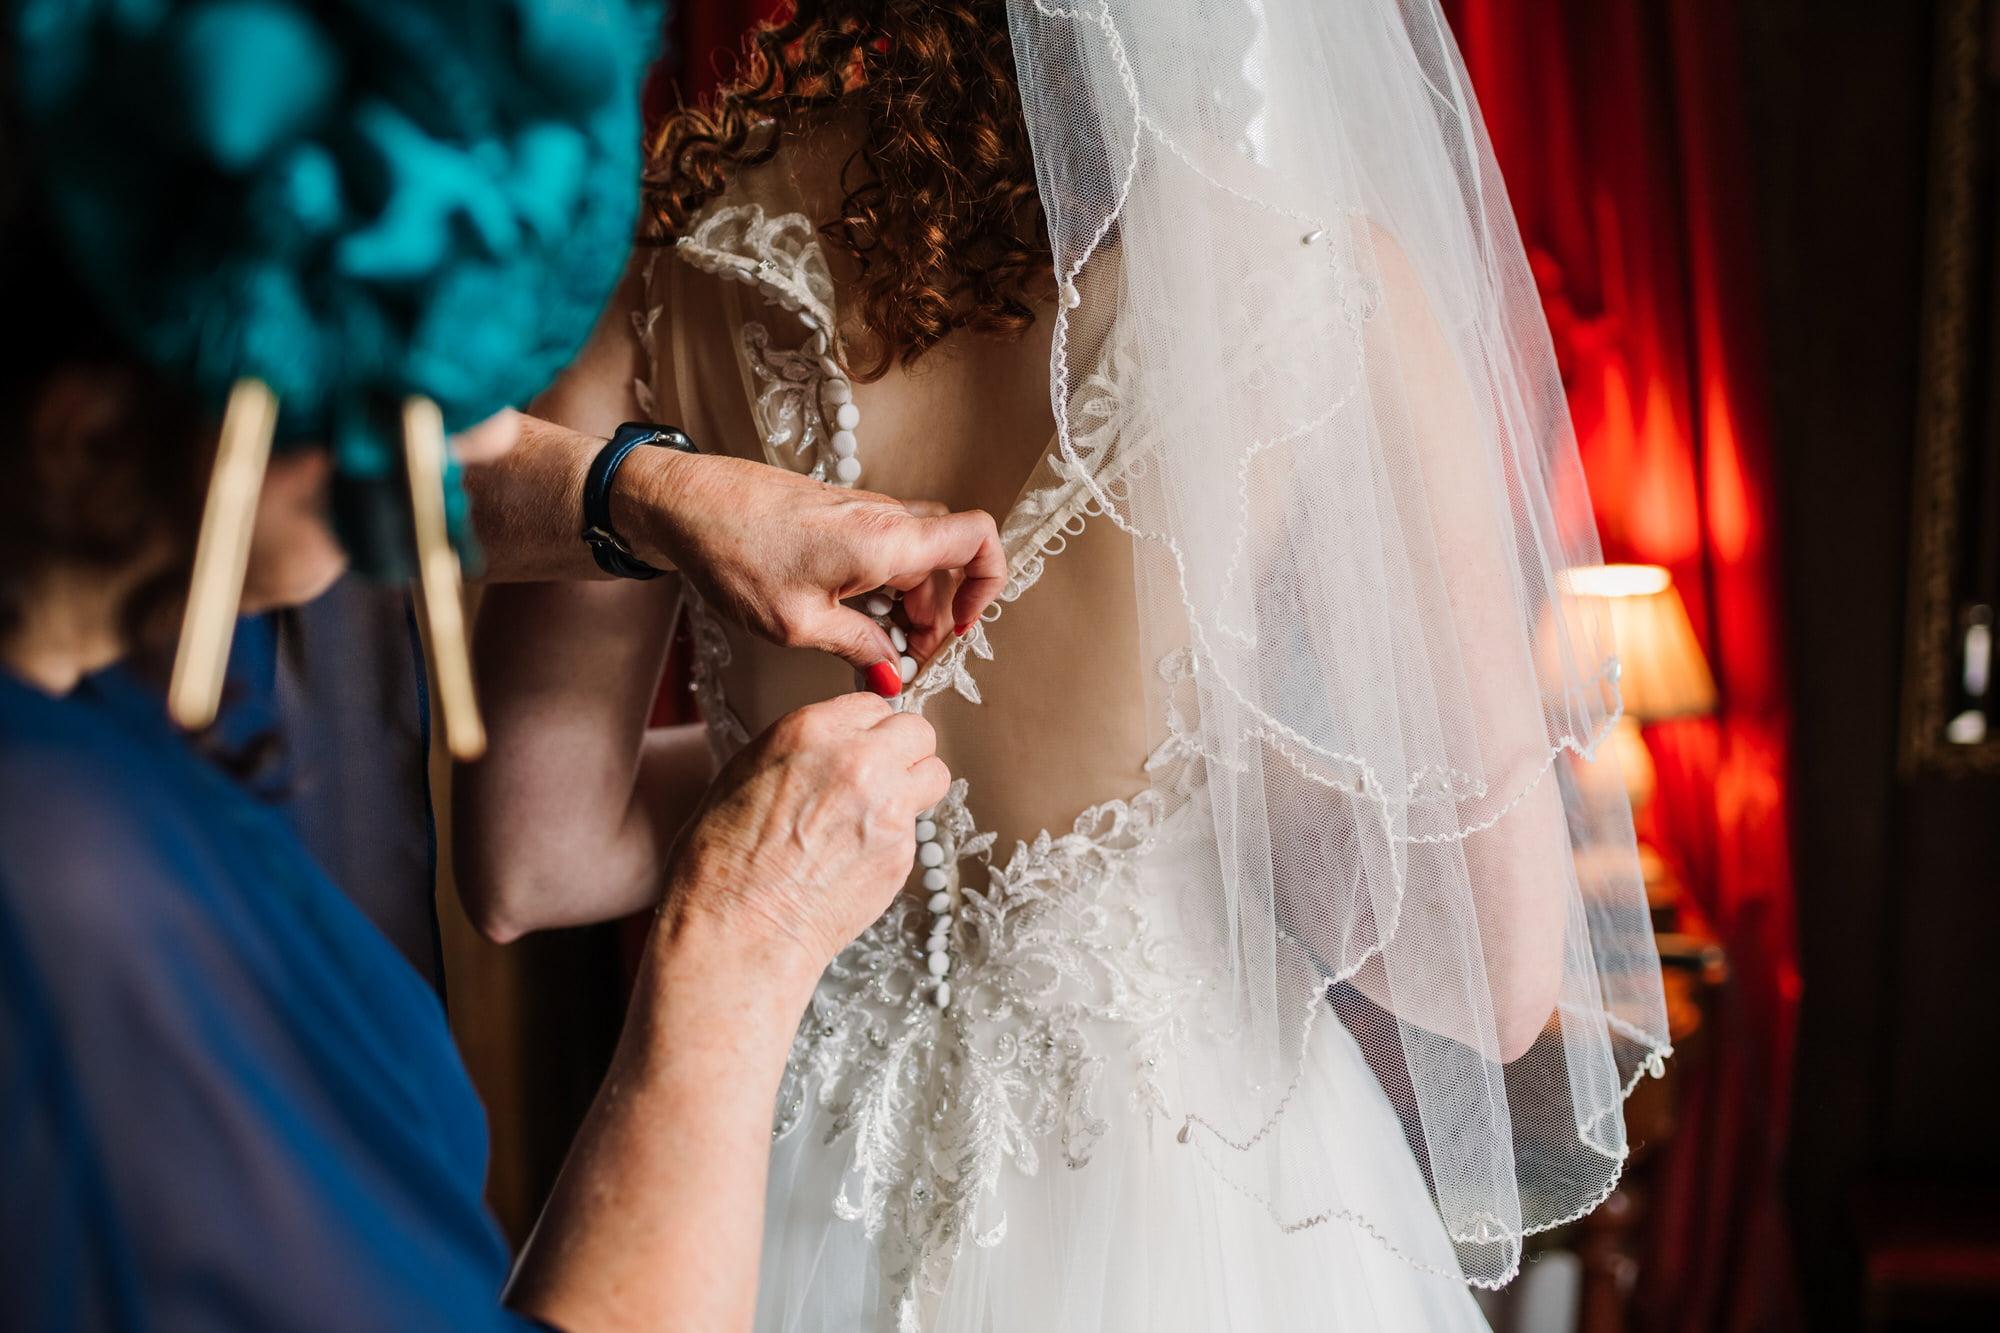 Bridal prep photos for Larmer Tree Gardens wedding